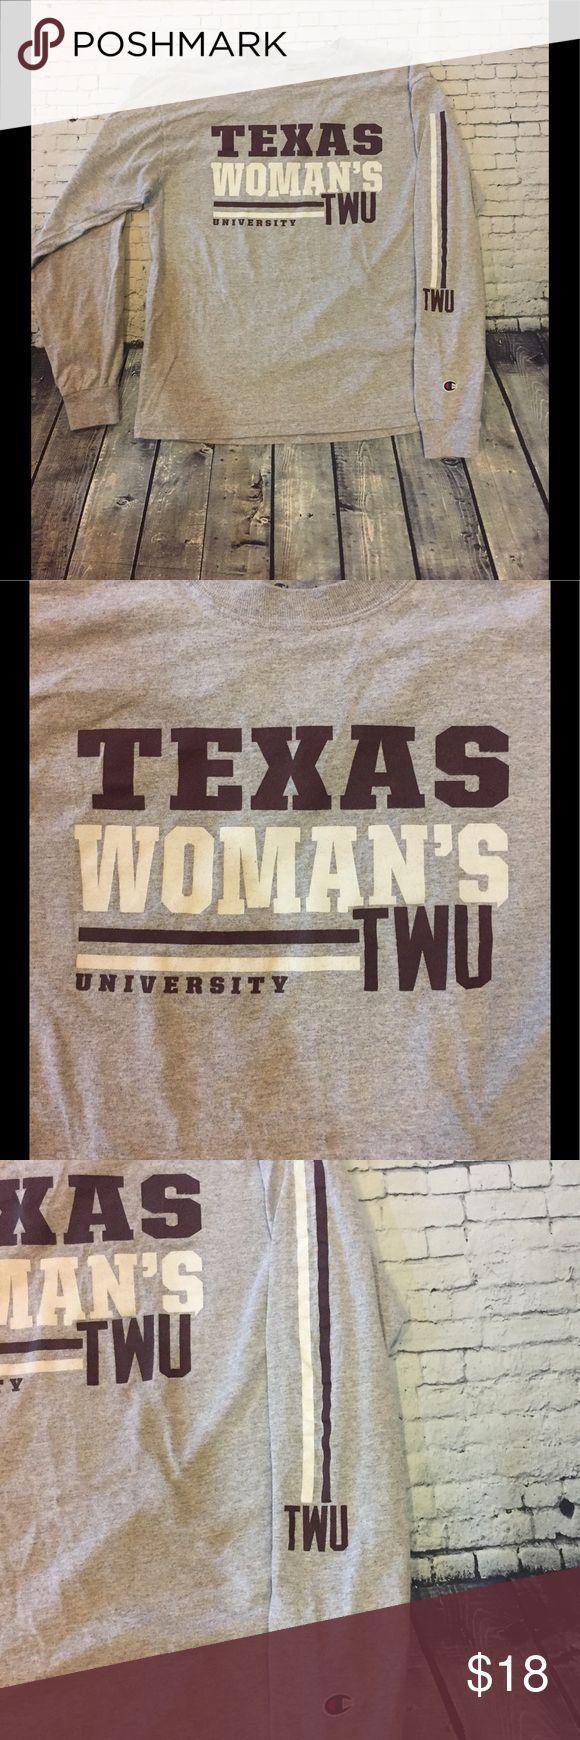 Like New! Champion TWU long sleeve tee, size M!!! Champion Texas Woman's University long sleeve tee, size M!!! Like New!!! 🎆🎆🎆 Champion Tops Tees - Long Sleeve